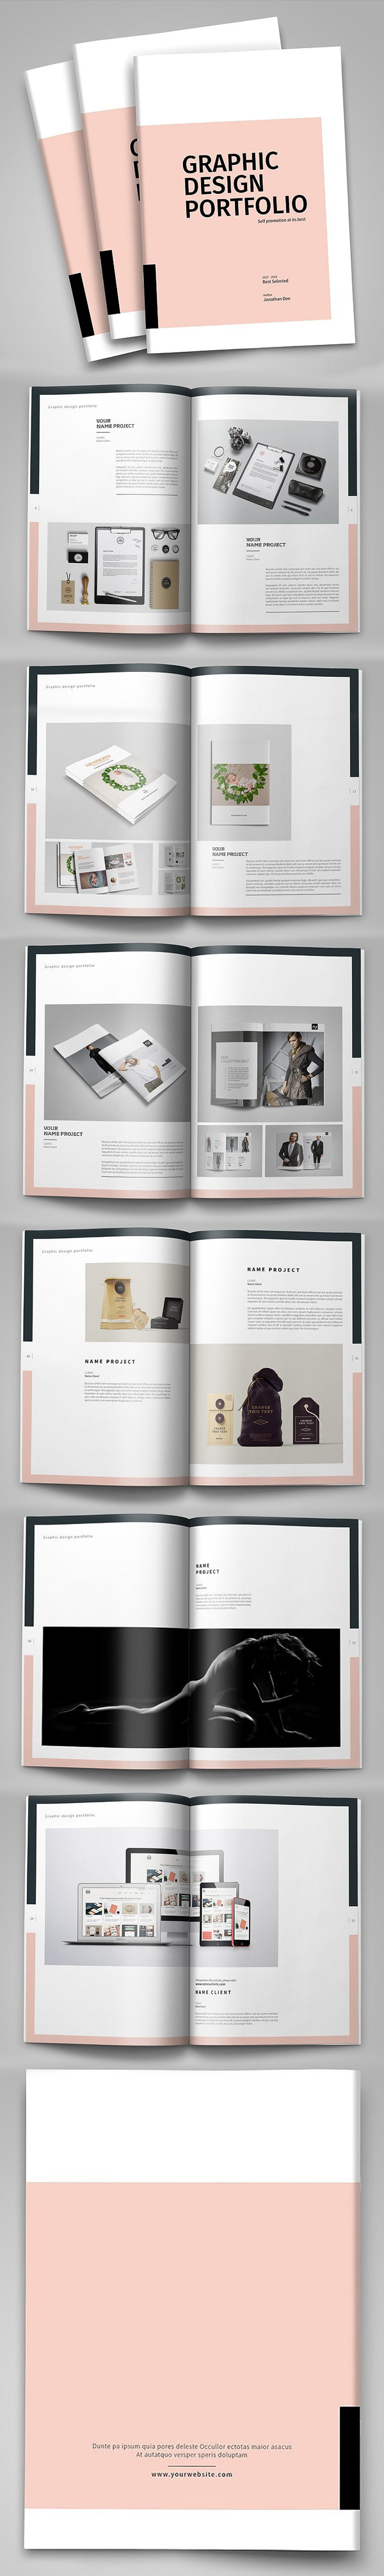 100 Professional Corporate Brochure Templates - 44